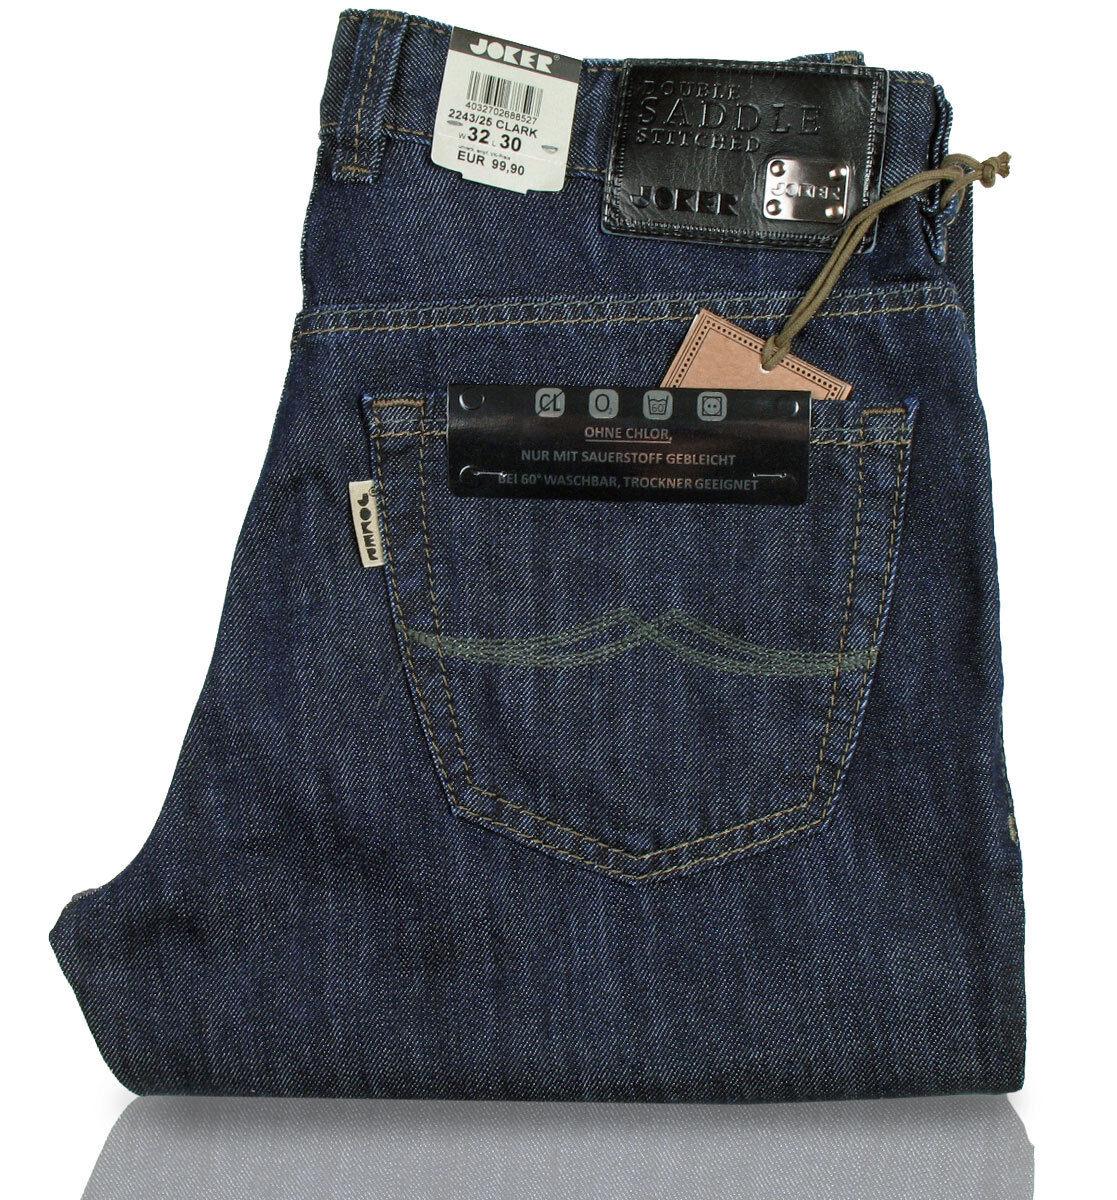 JOKER Jeans   Clark 2243 2243 2243 25 ( Comfort Fit ) dark Blau rinsed e4e3a5